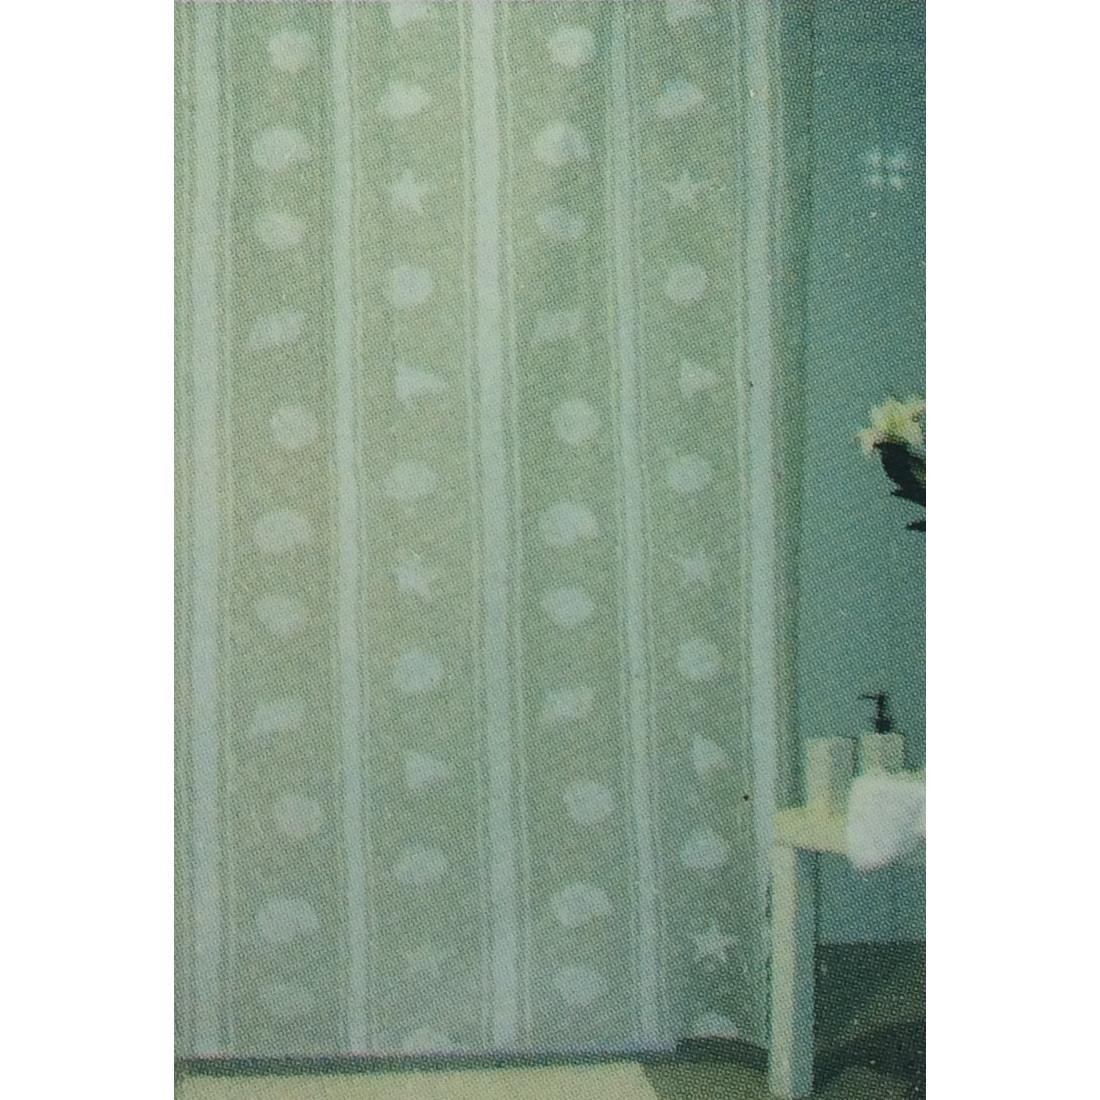 Duschabtrennung mit Ringe Badvorhang   Wannenvorhang Duschvorhang 180 x 180 cm ,UAB,000051182752, 4770364246739